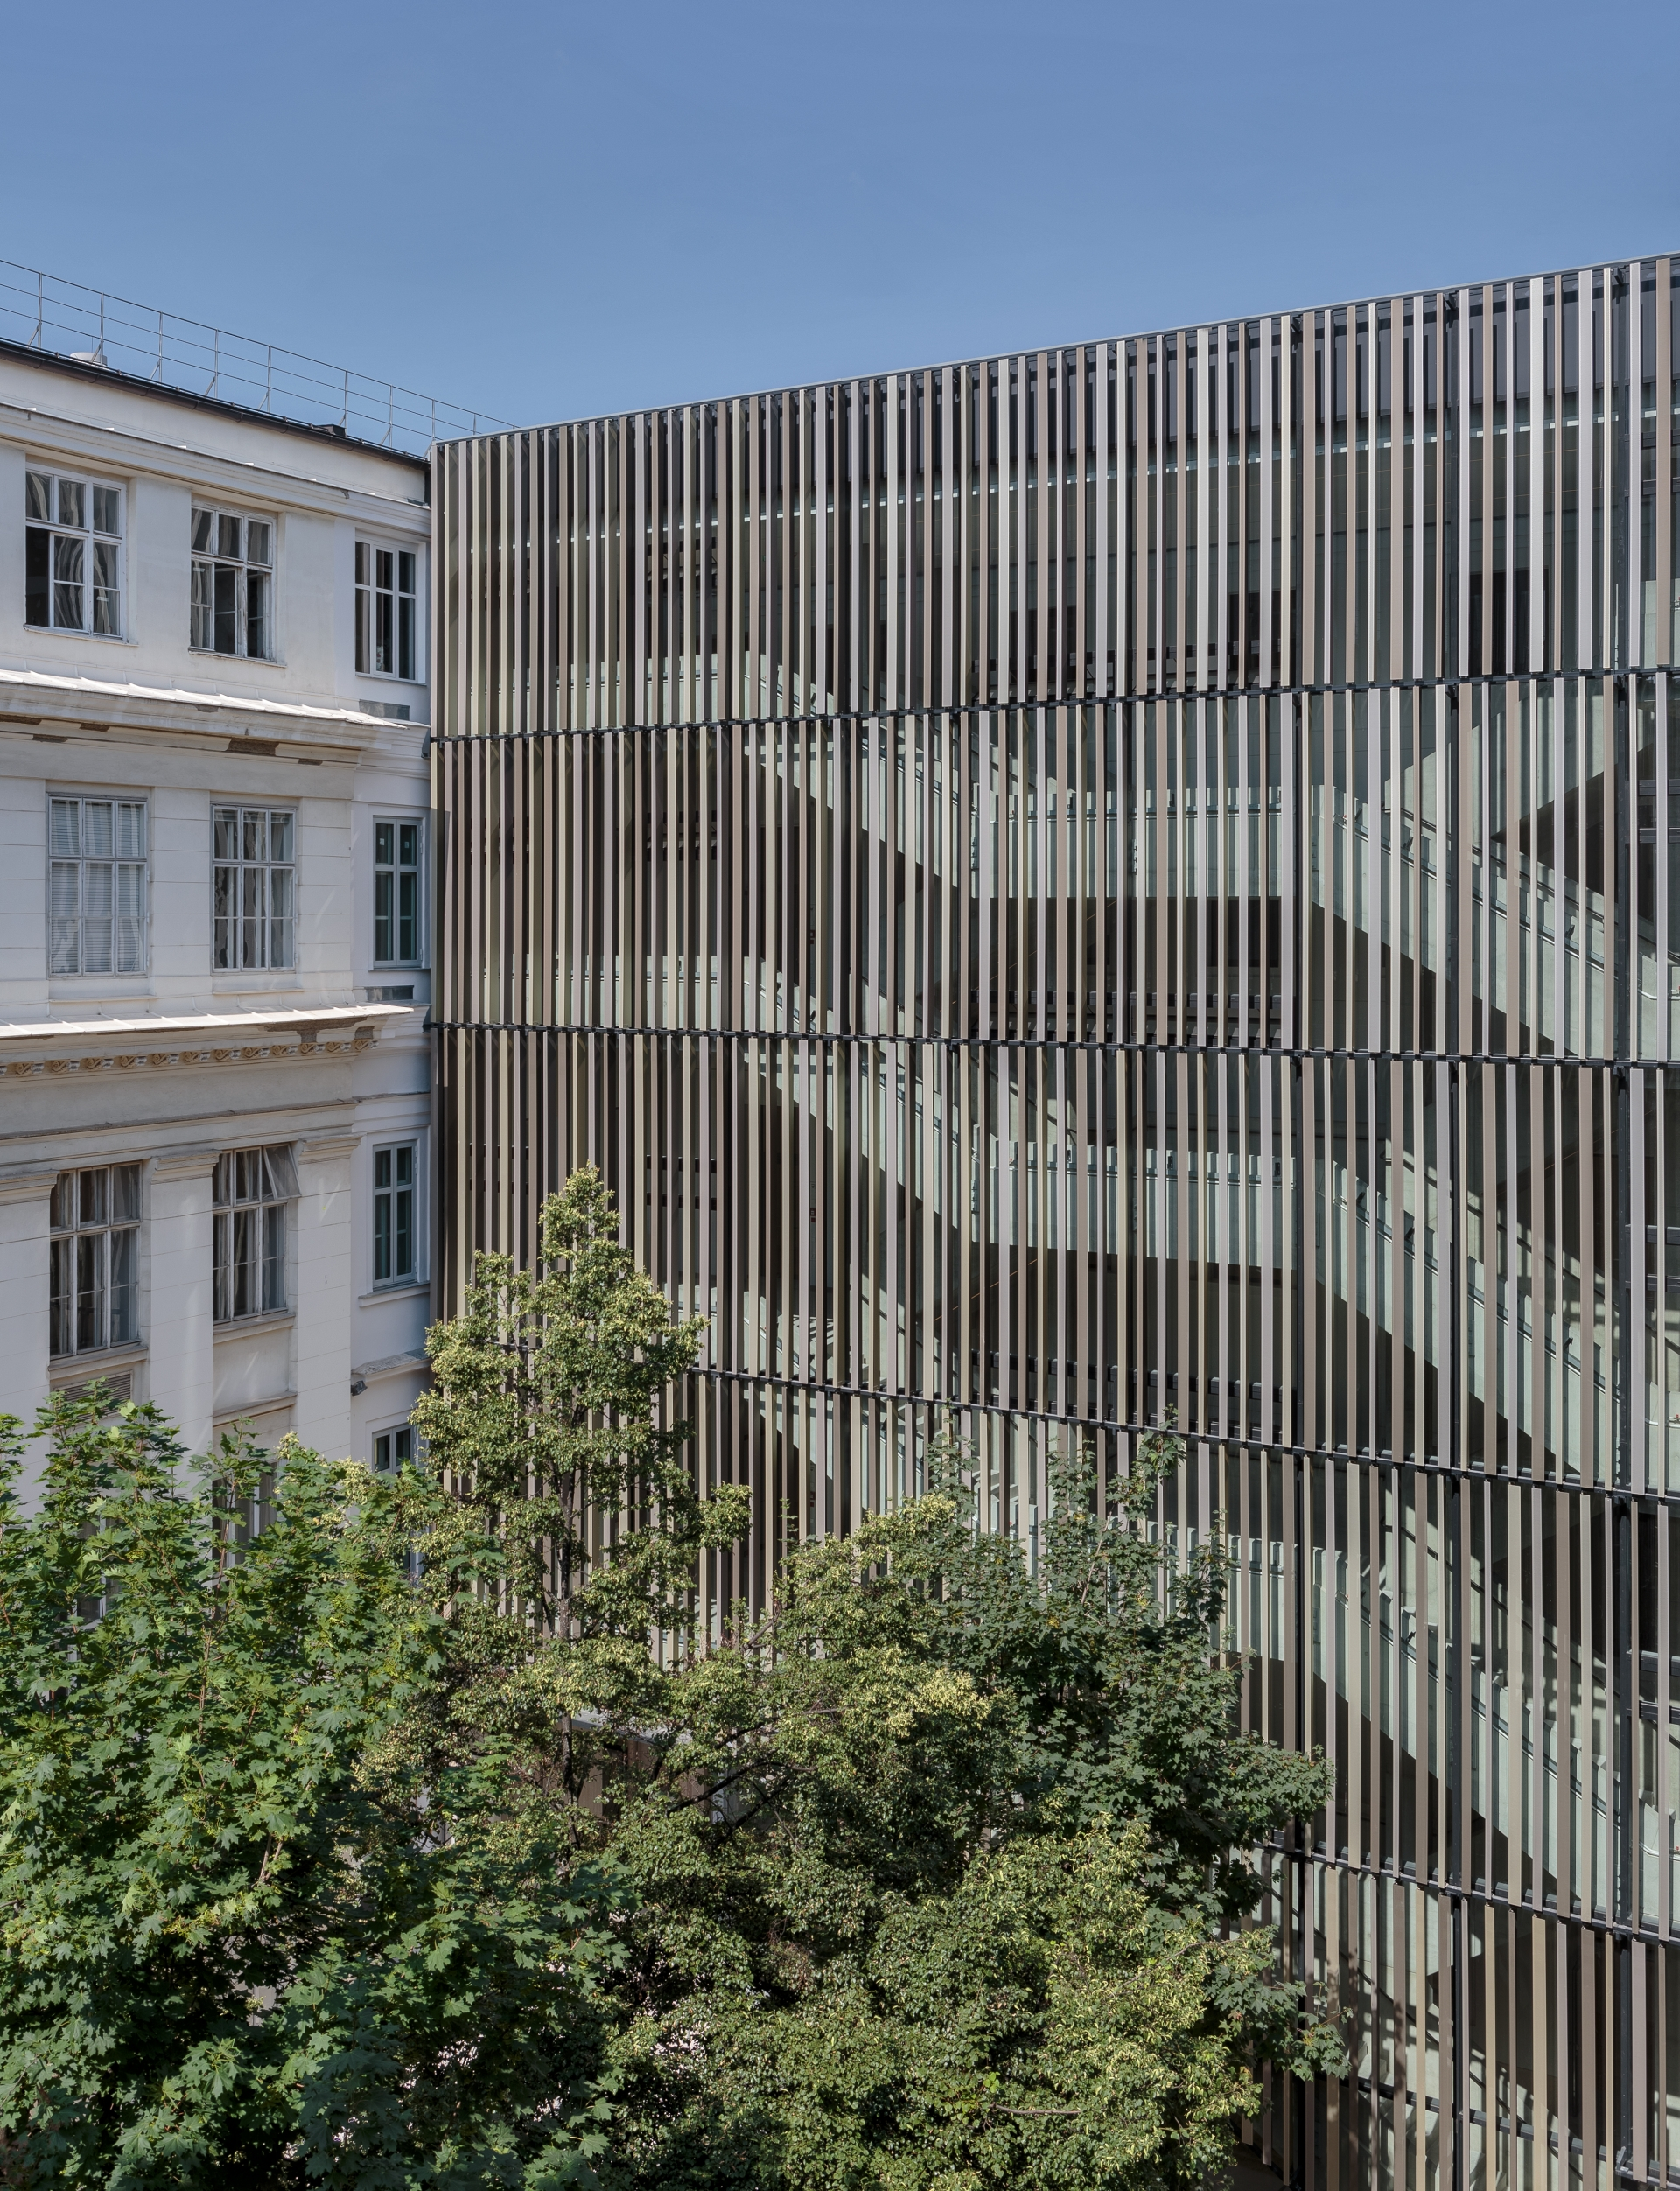 MAXIMILIAN HAIDACHER / PHOTOGRAPHY TU Wien